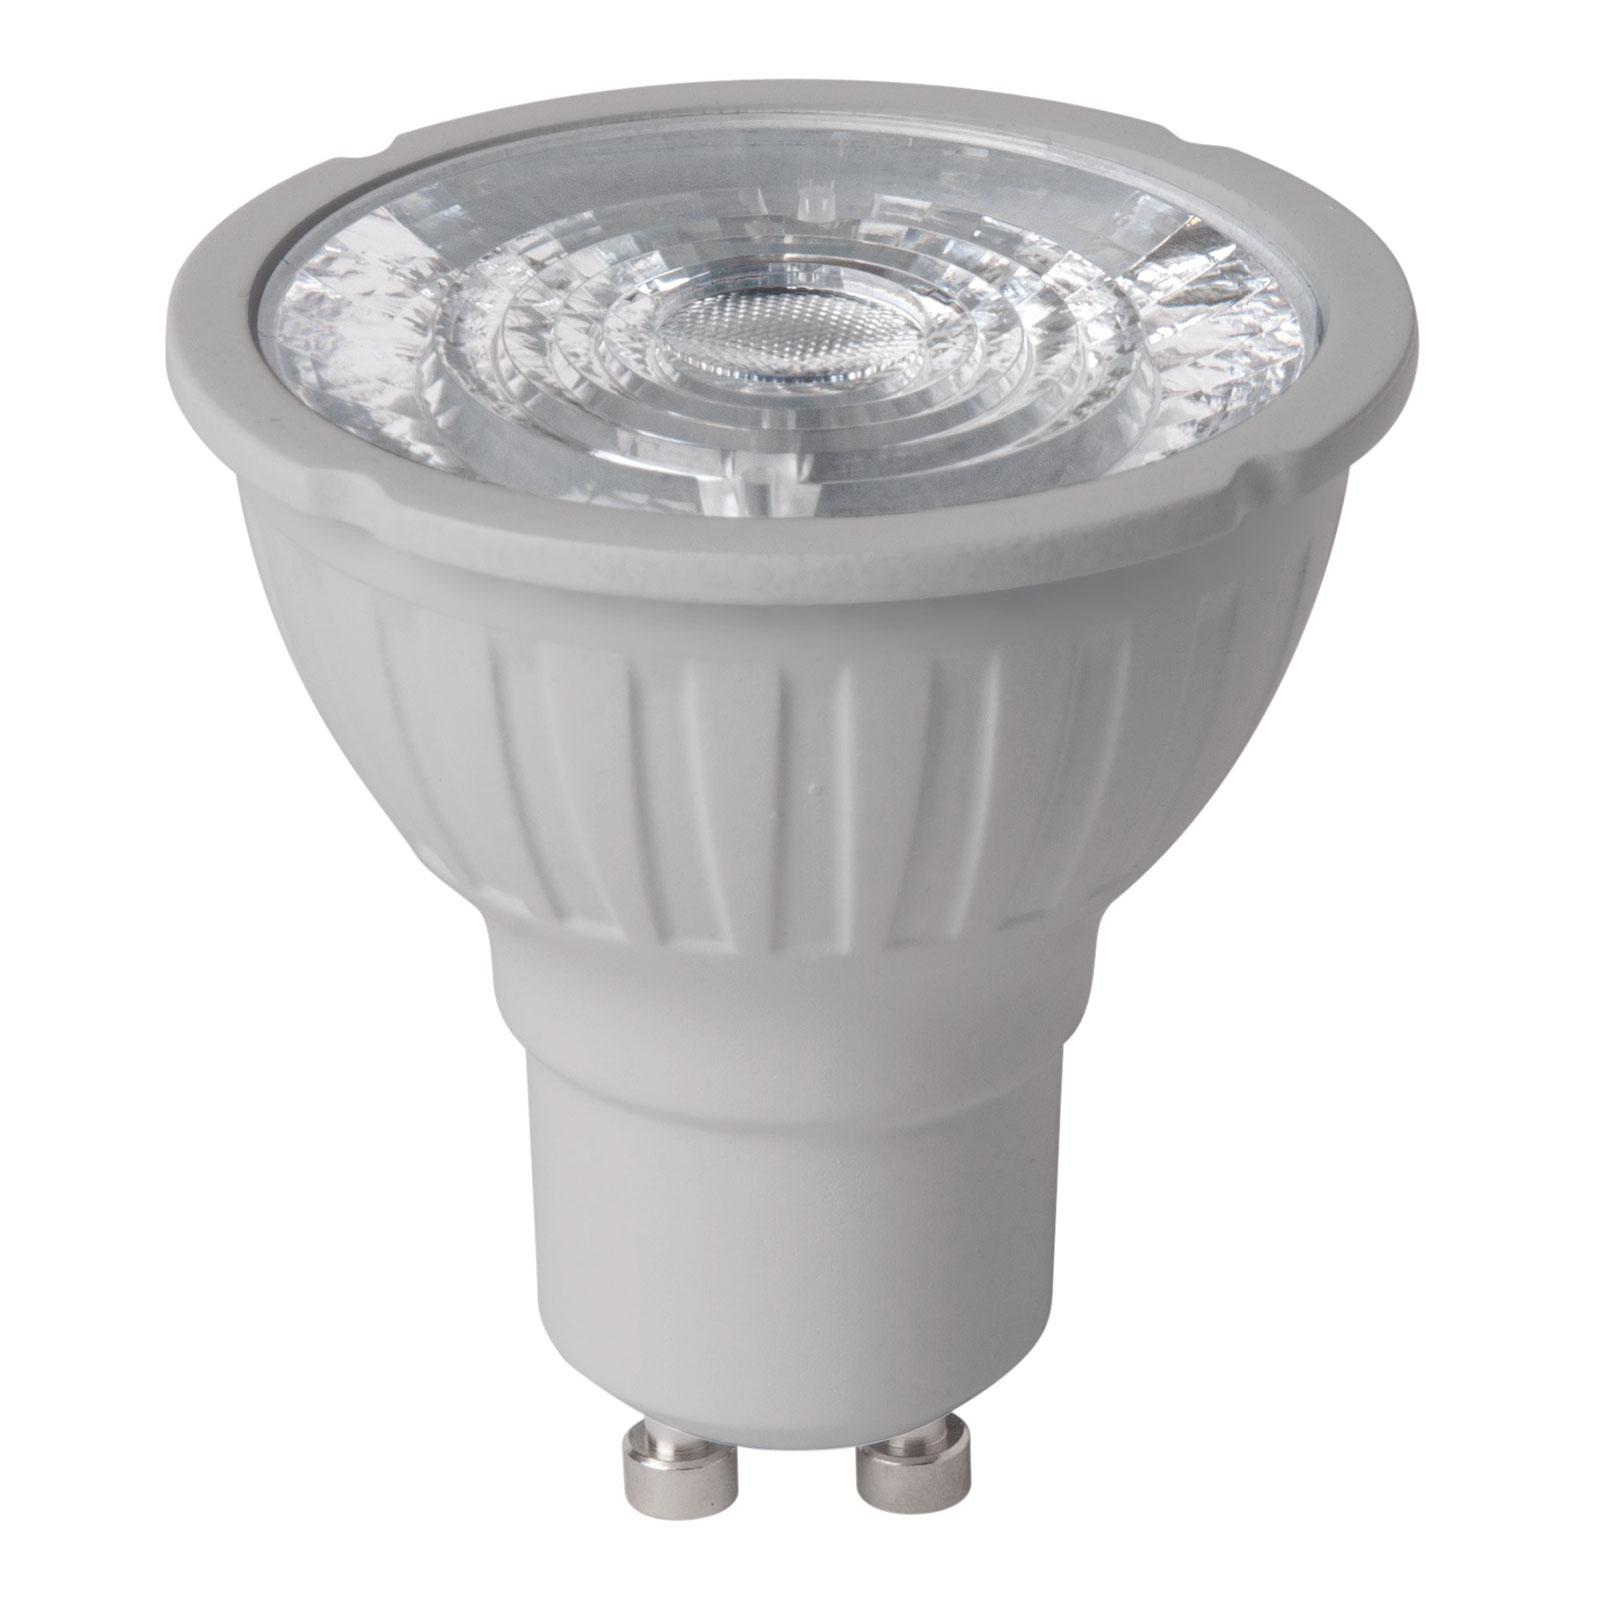 LED-reflektor GU10 Dual Beam 5,2 W dimbar 2800 K